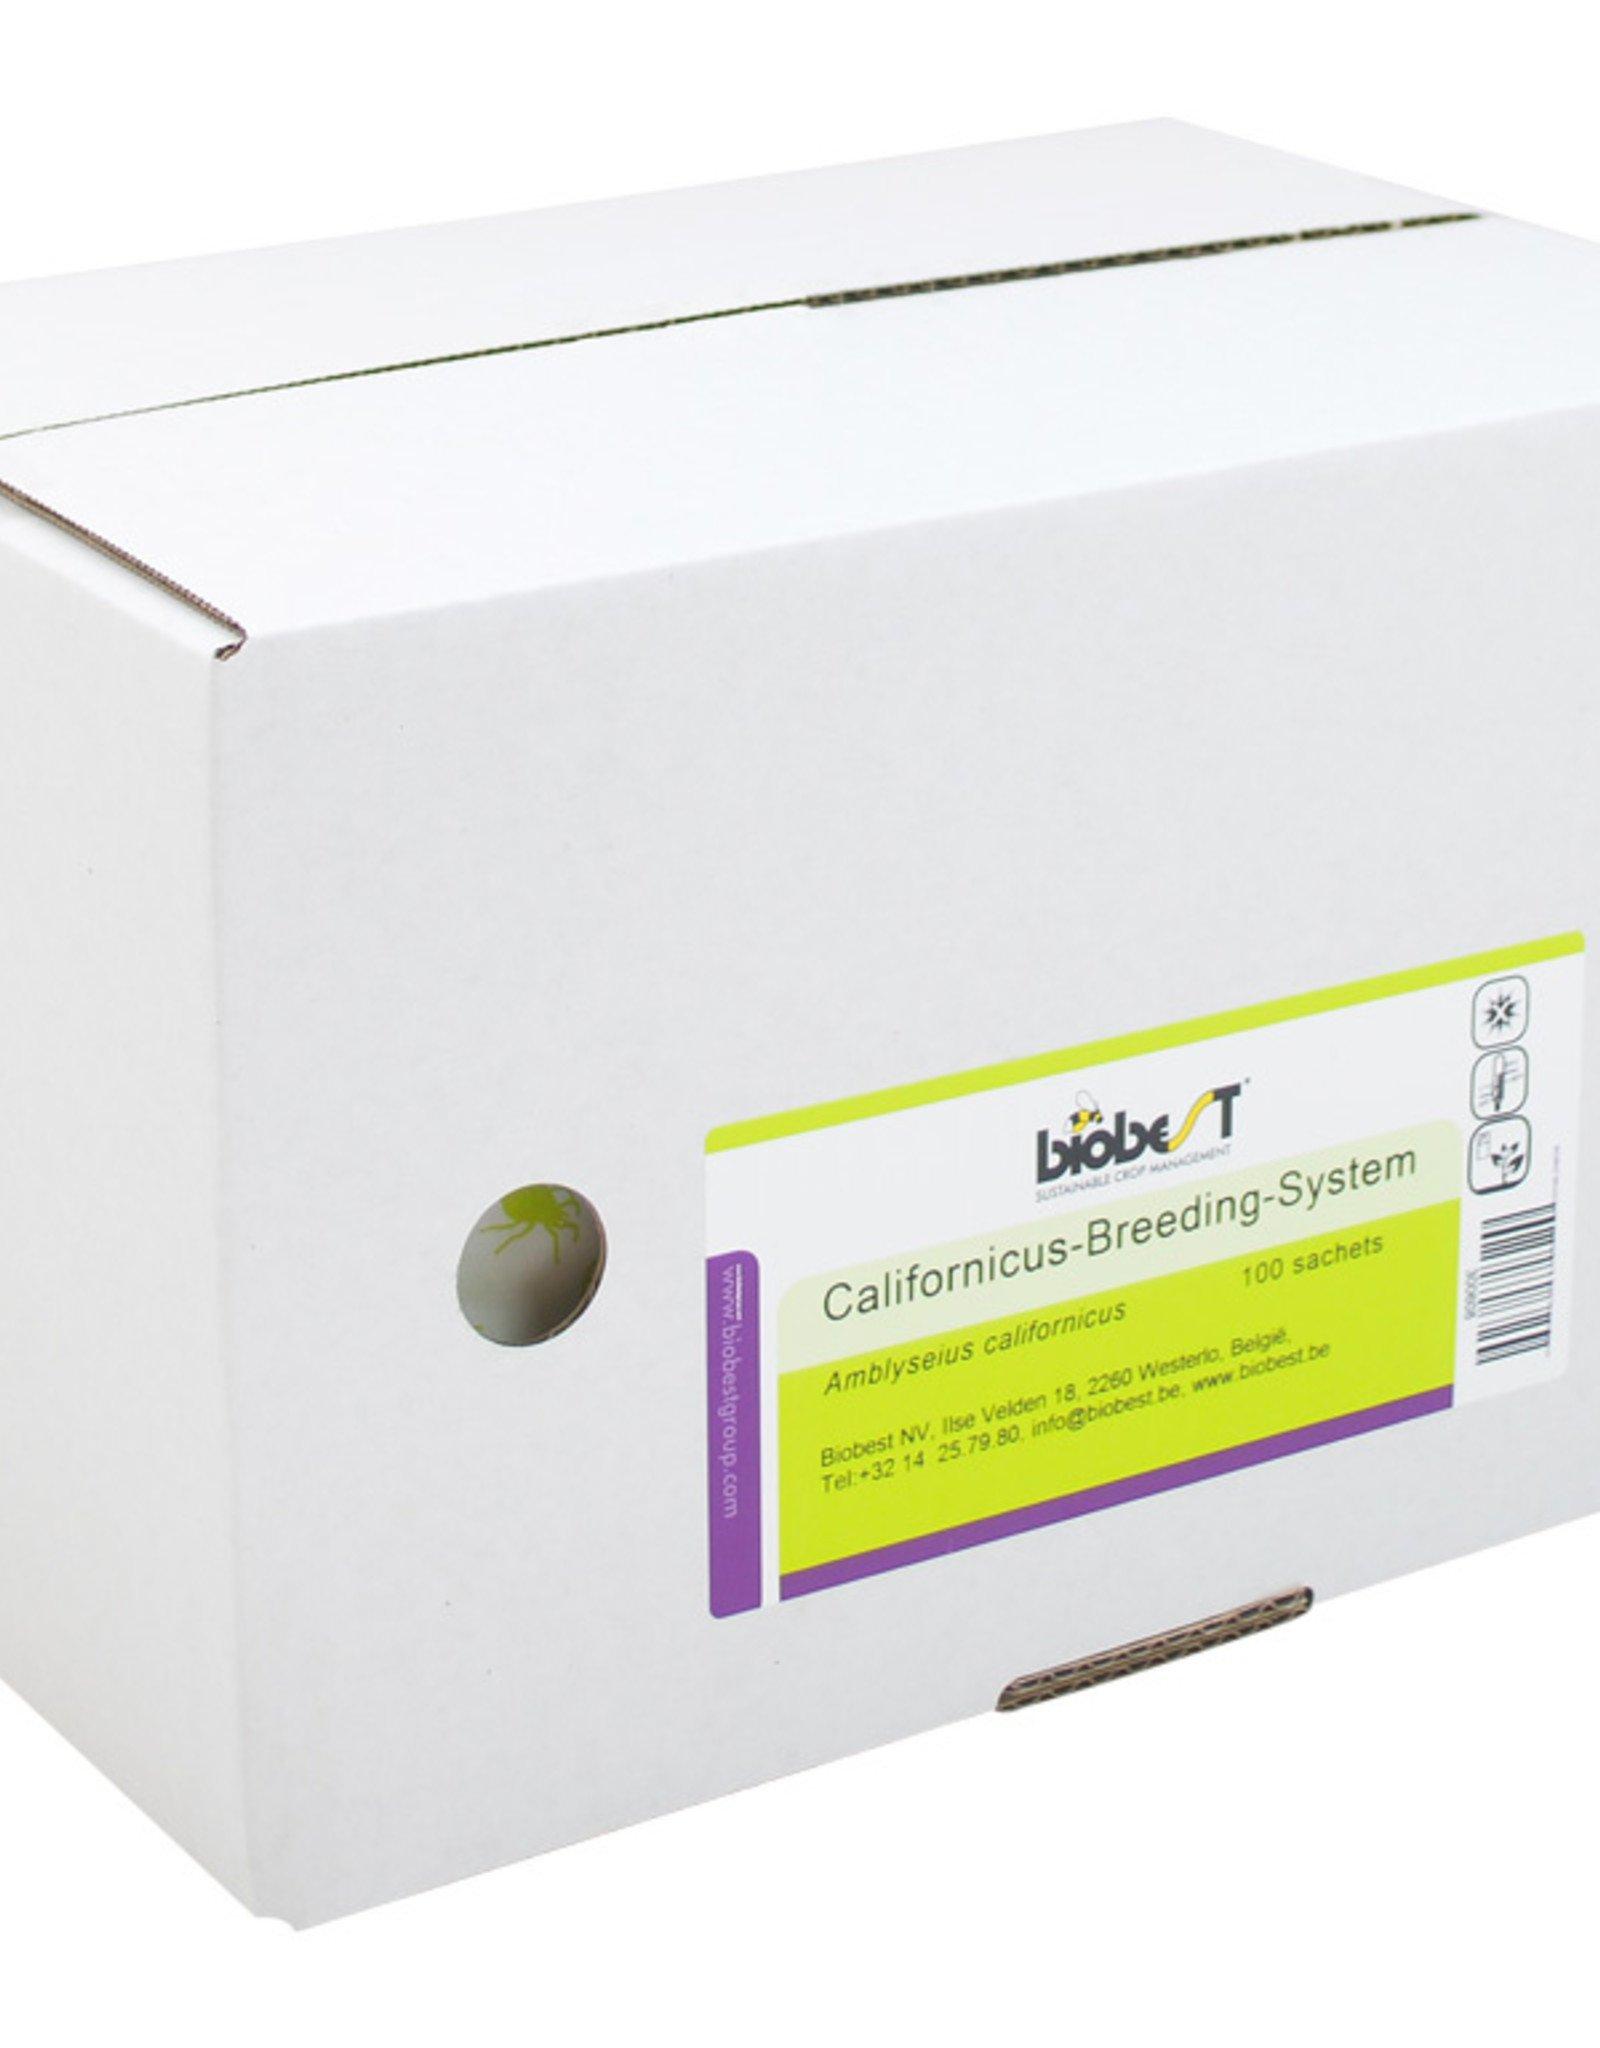 Brimex Biobest Roofmijt Brimex Californicus Breeding System